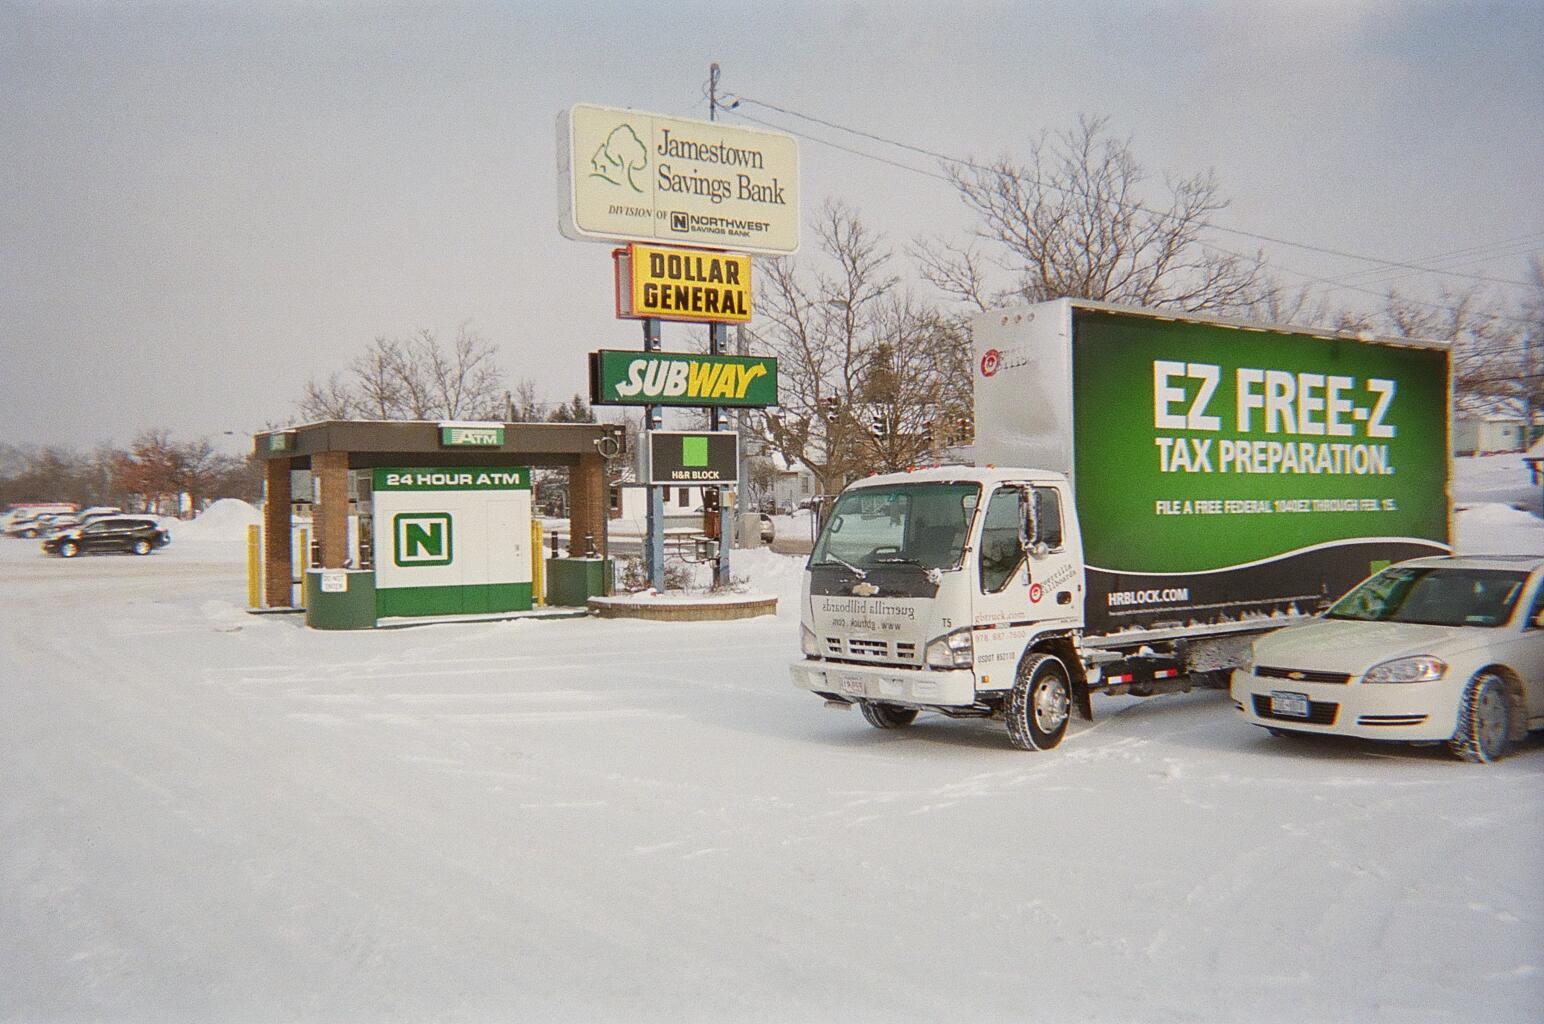 H&RB Block billboard truck in Jamestown NY